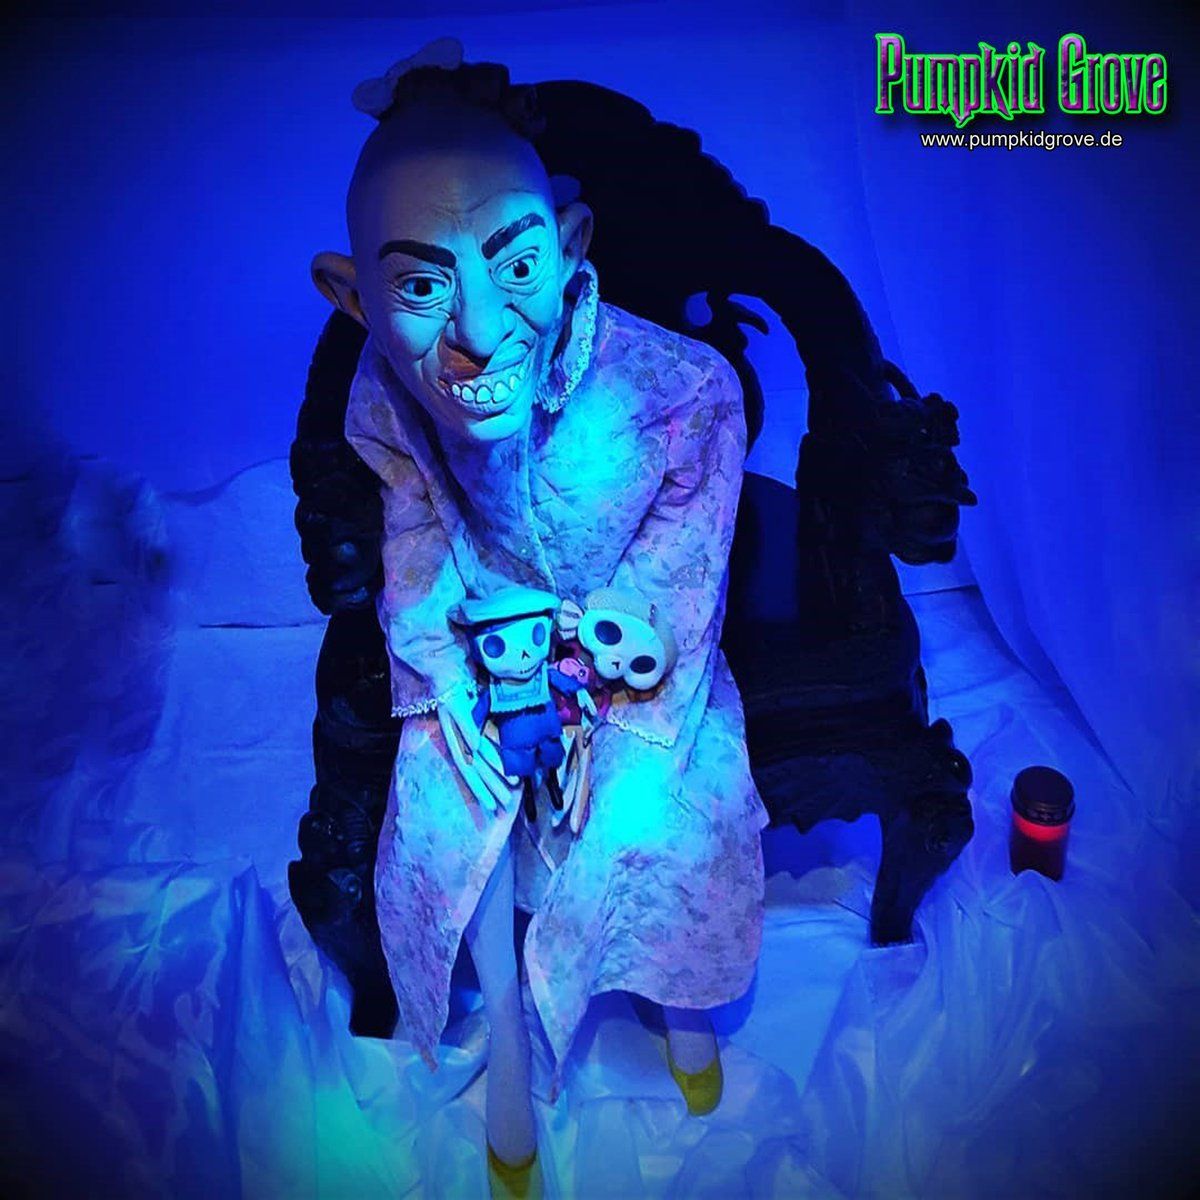 Pepper  #halloween2015 #halloween #samhain #luegburghorrorstory #ahsfx #pepper #thron #throne #kerze #candle #blau #blue #gruselig #haunted #horror #homehaunt #love#trickortreat #party #fun #art #halloweendecorations #dekoration #photo #germany #pumpkidgrove #pumpkidgrovegermany https://t.co/Yh9ZZBRA1u